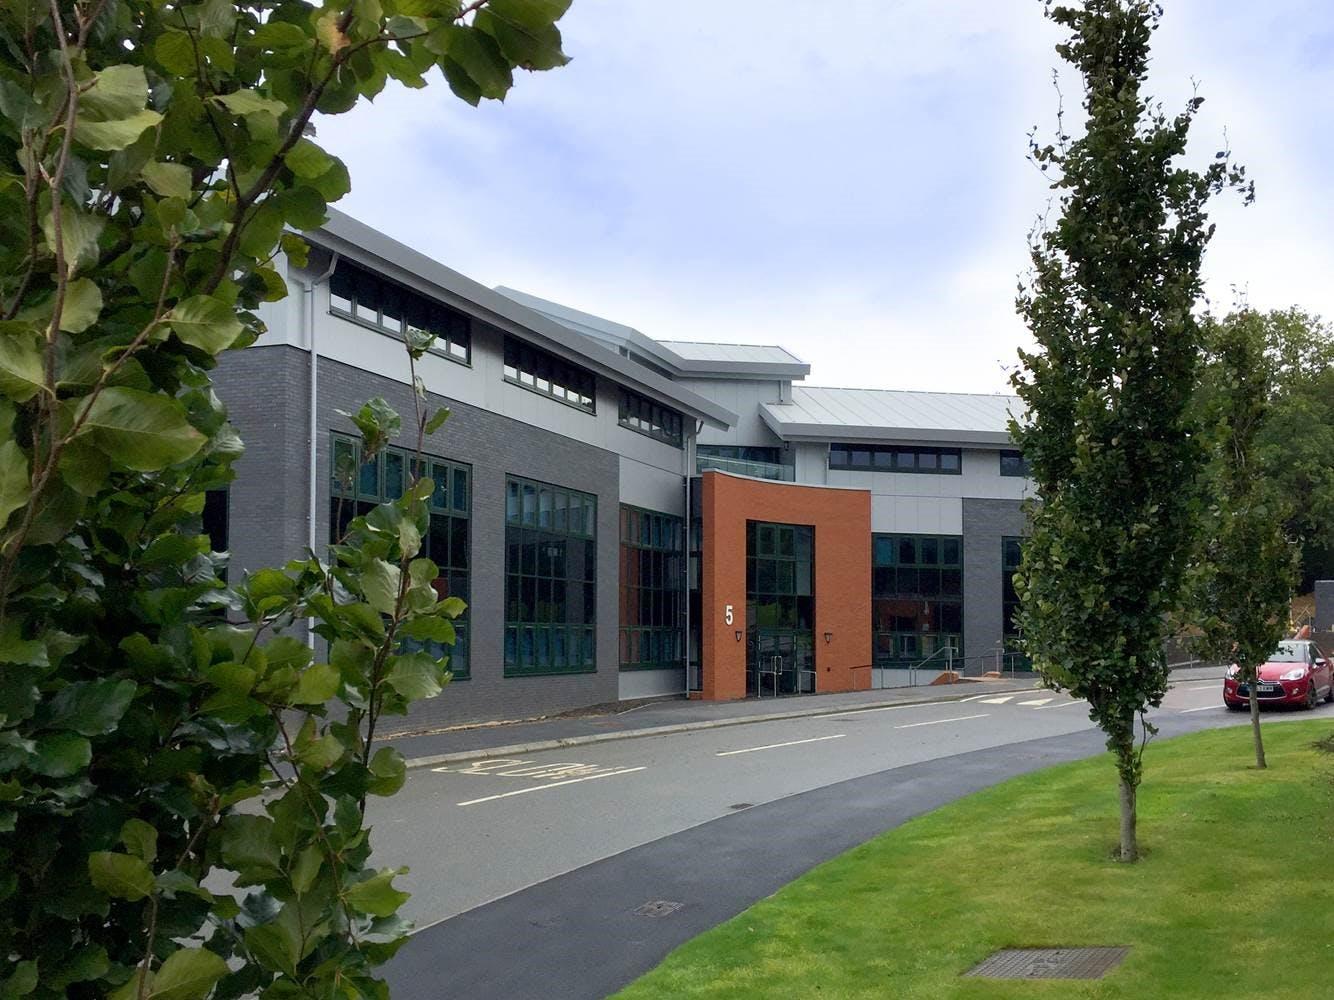 Southampton Science Park - 5 Benham Campus, Southampton